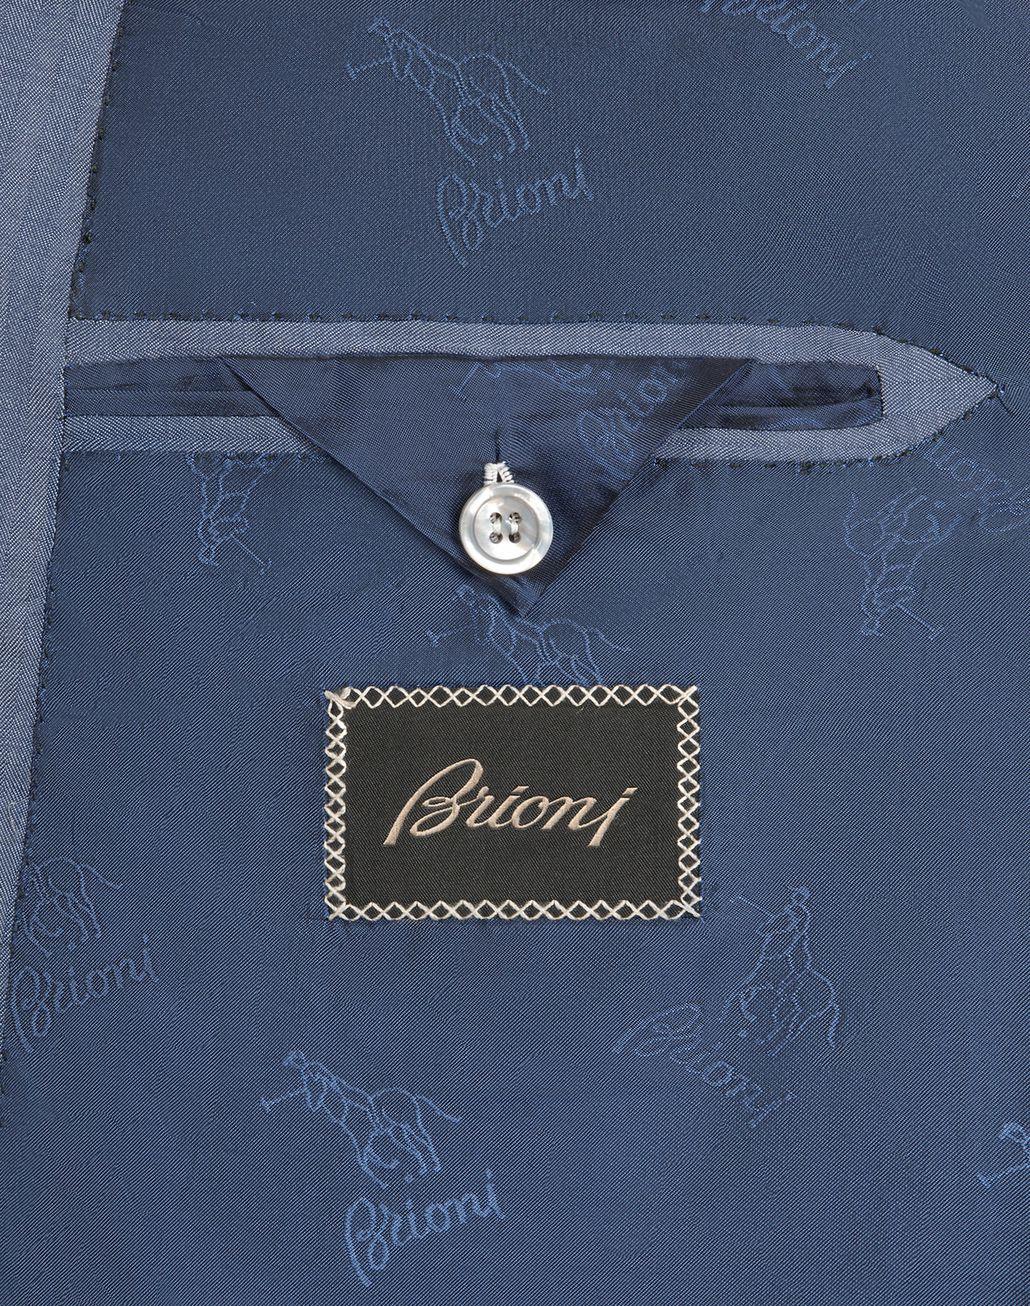 "BRIONI Голубой костюм Ravello с мелким узором ""в ёлочку""   Suits & Jackets Для Мужчин b"